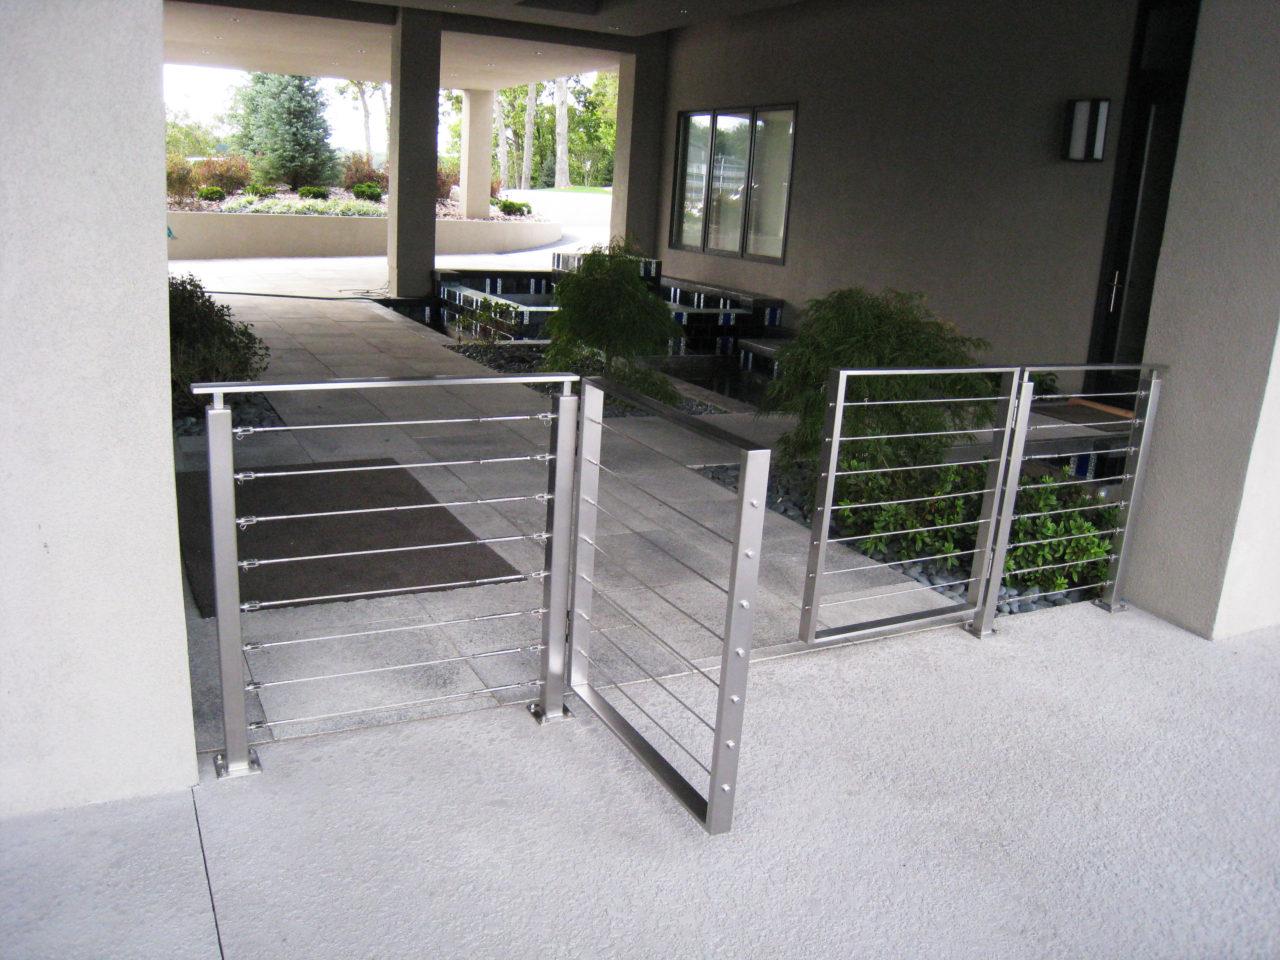 STAINLESS WALK GATE